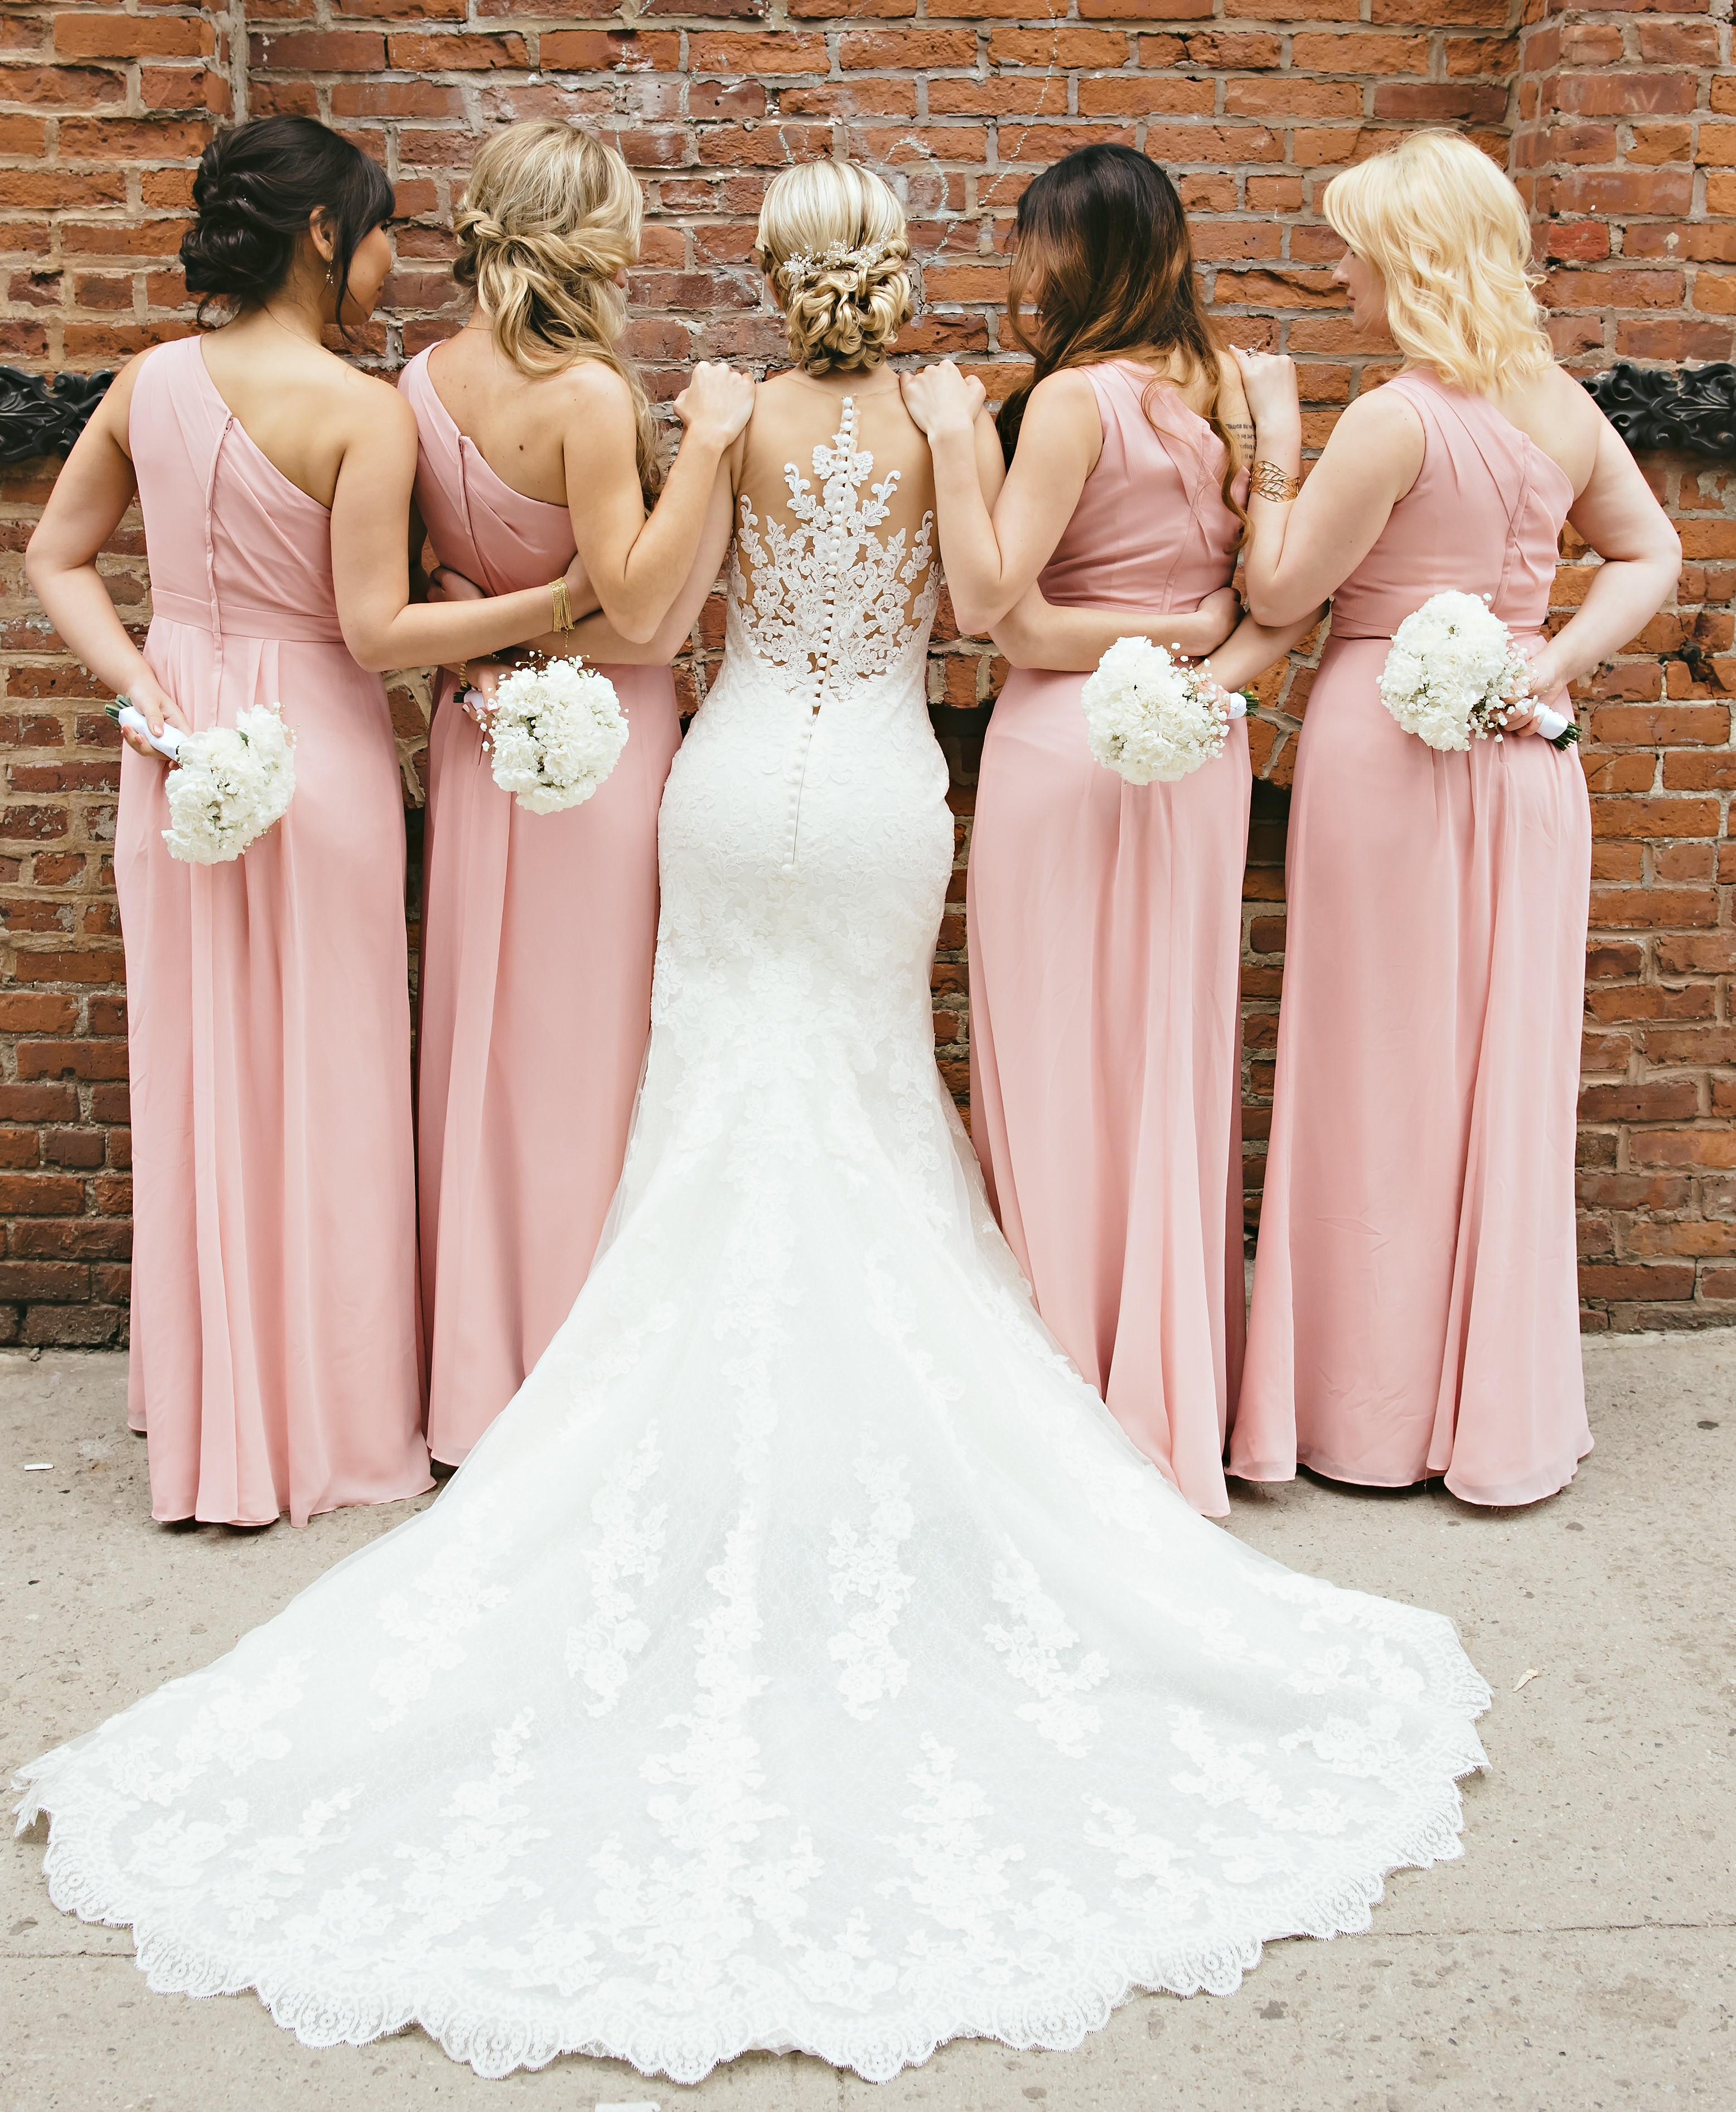 PRONOVIAS PLACIA WEDDING DRESS, UK14, £900 - Romantique Bridal